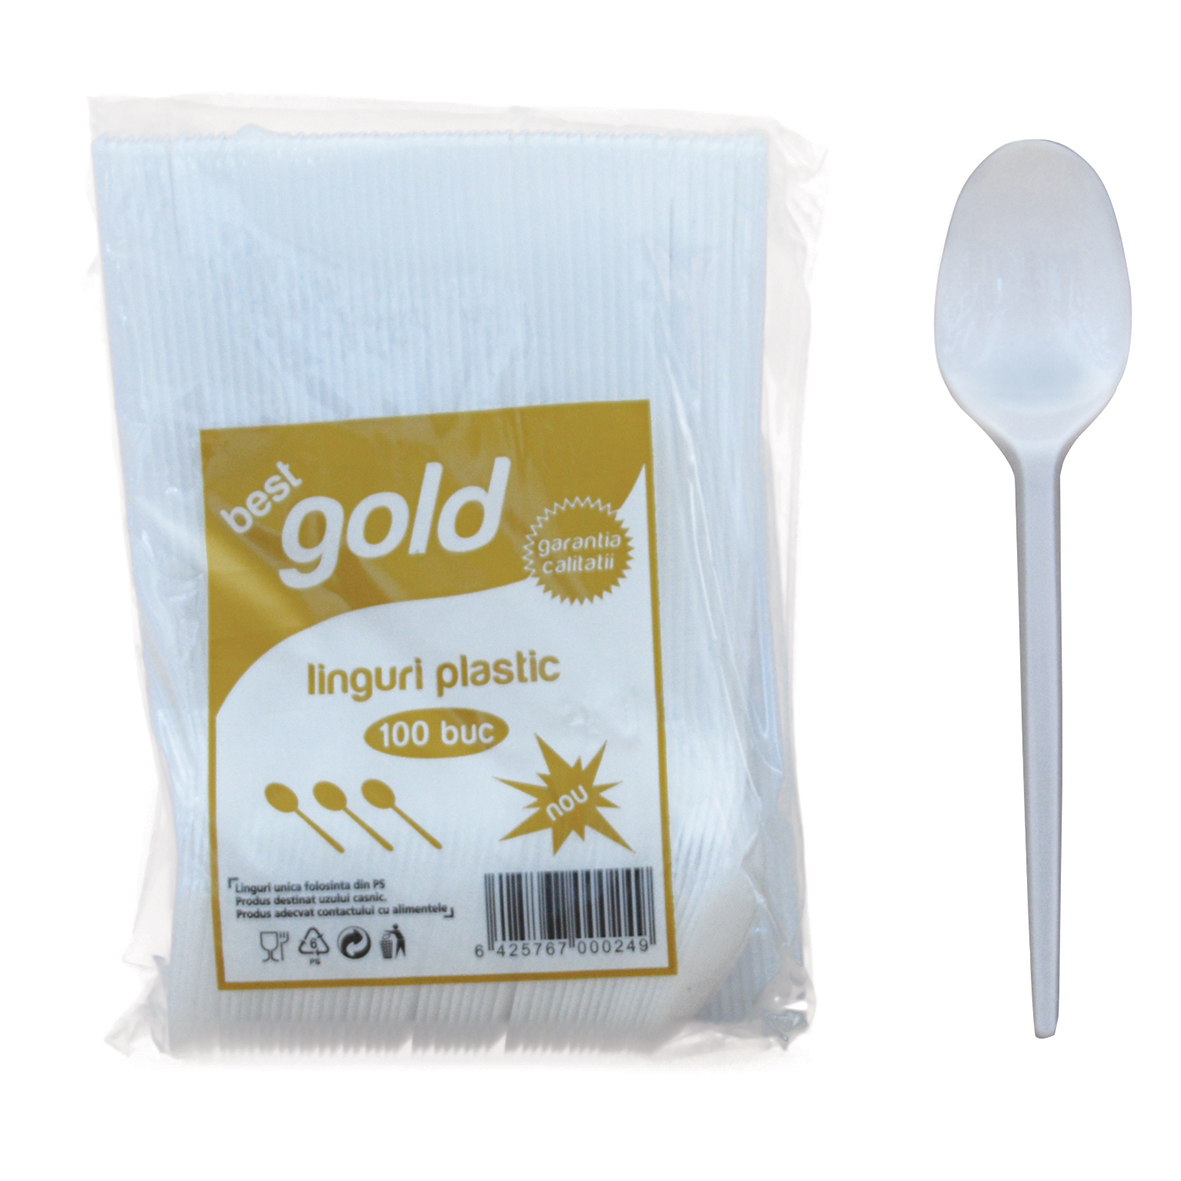 Linguri Din Plastic Gold 100 Buc/Set 2021 sanito.ro